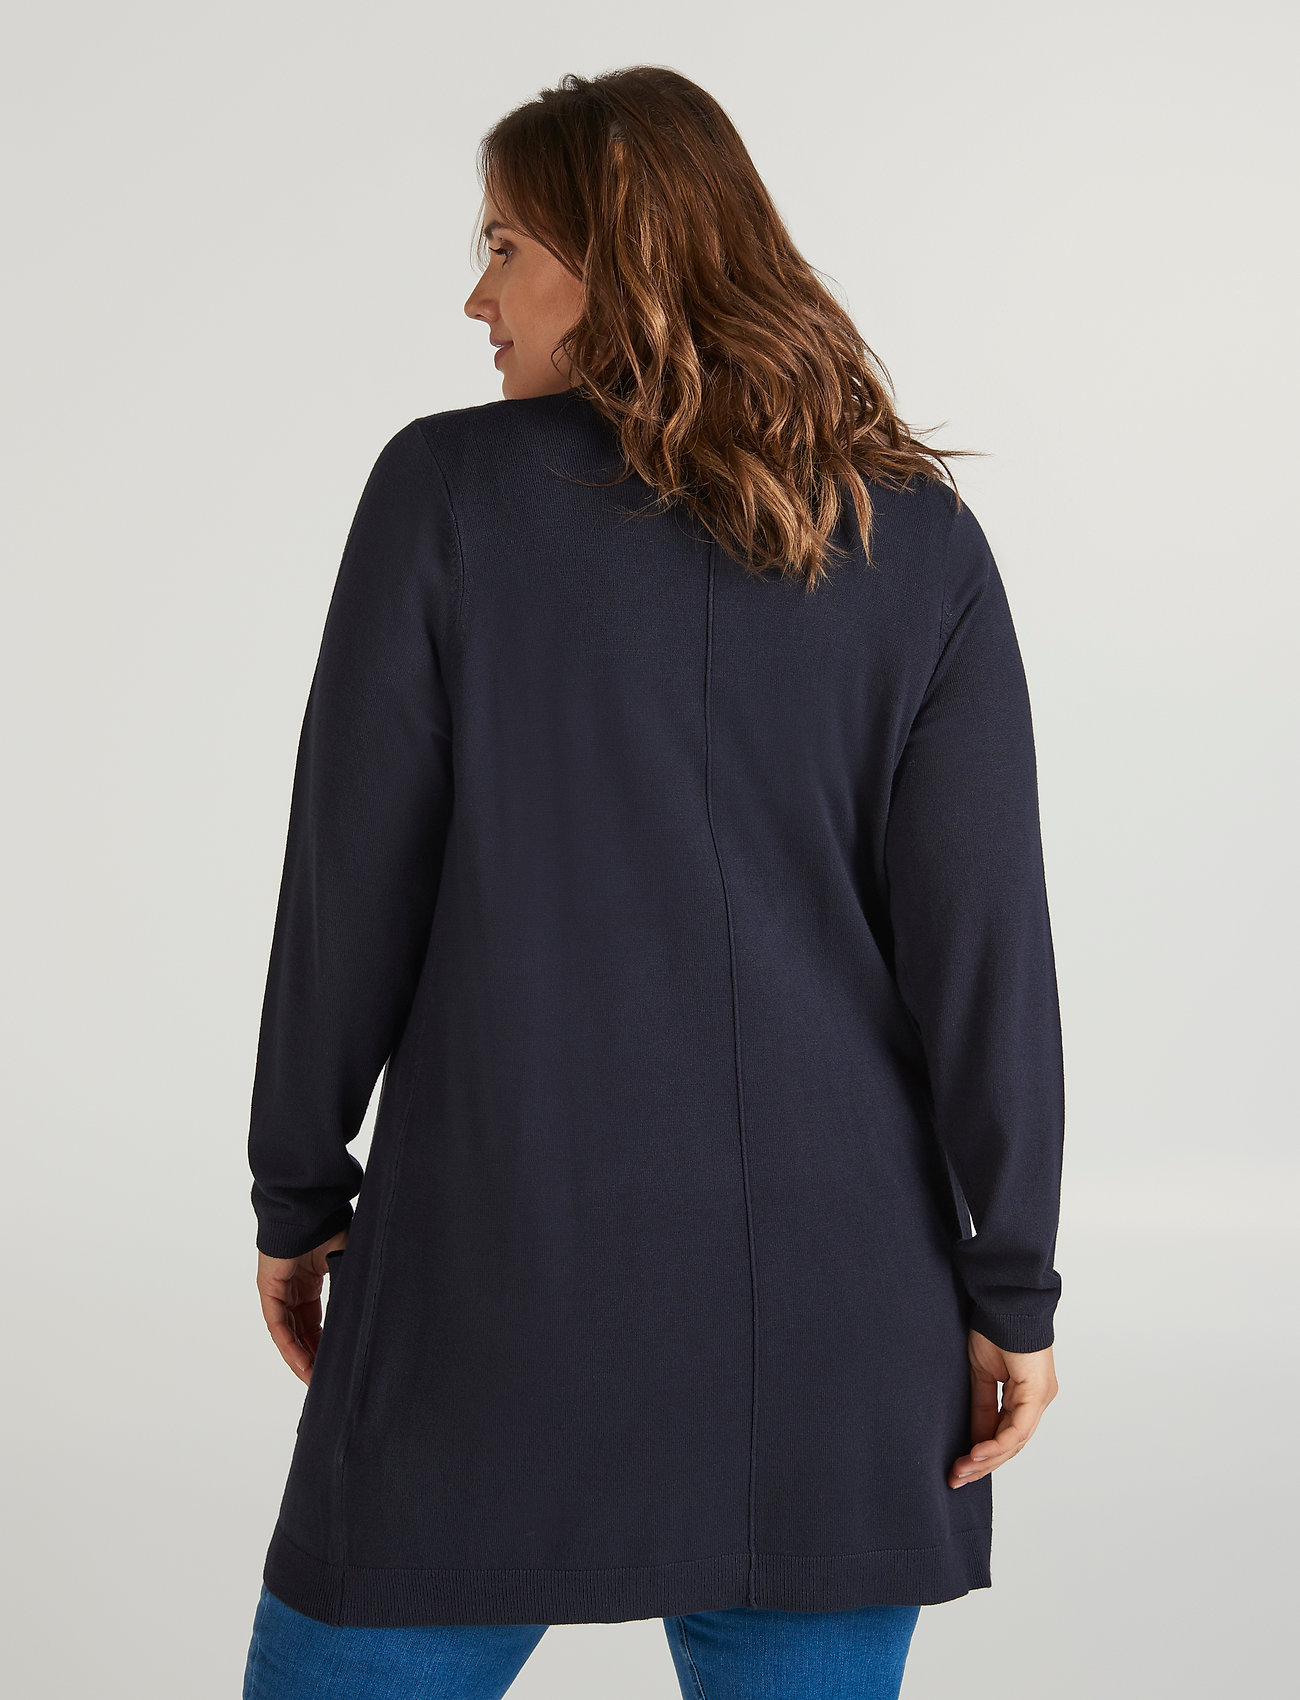 Zizzi Cardigan, Long Sleeve - Strickmode DARK BLUE - Damen Kleidung